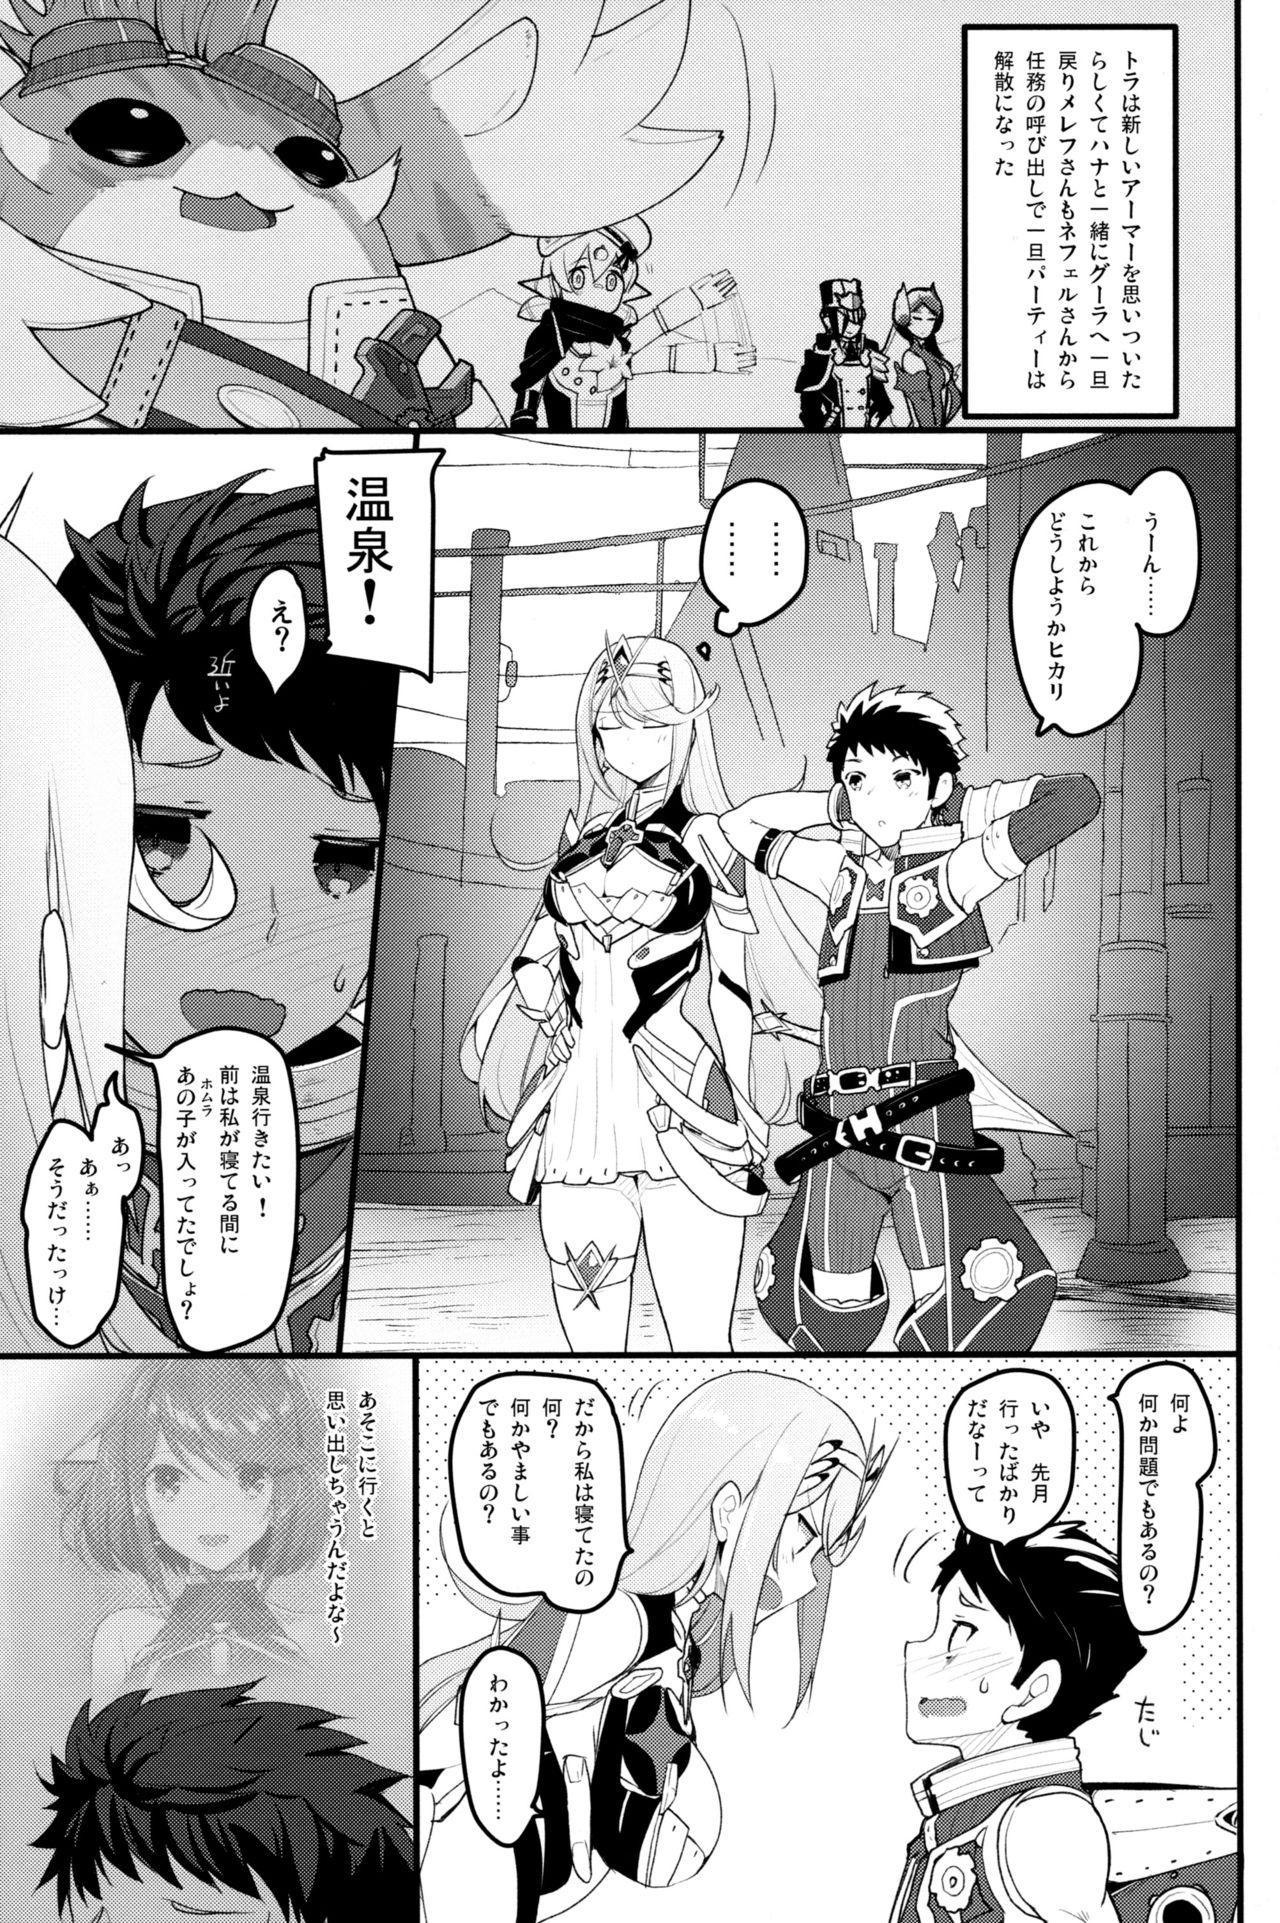 Superbia no Amai Yoru 2 3